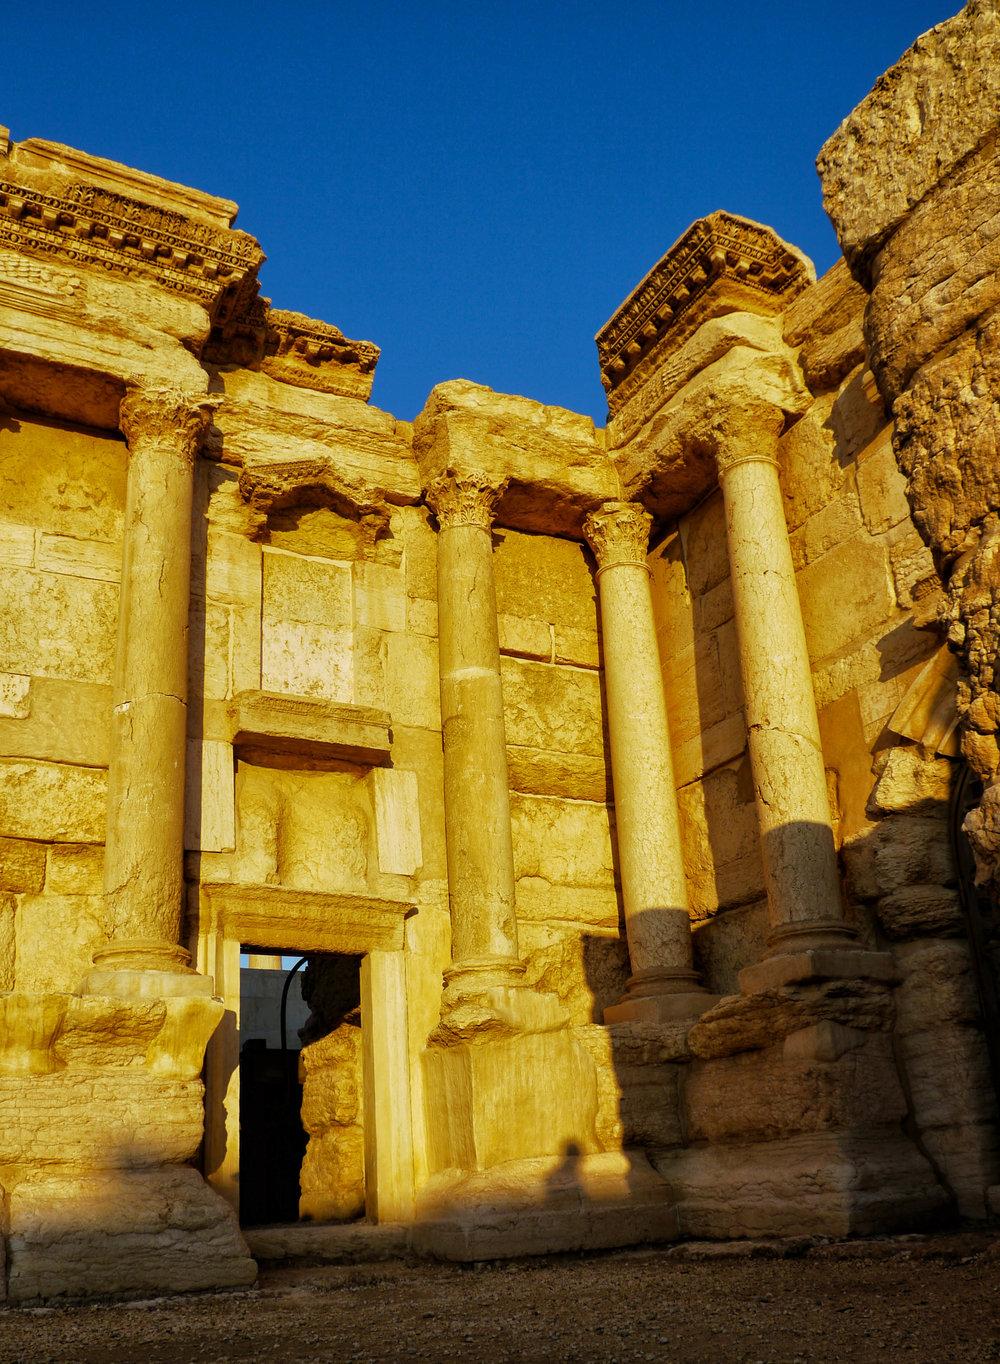 14 Syria 2009 Palmyra 4 (1 of 1).jpg